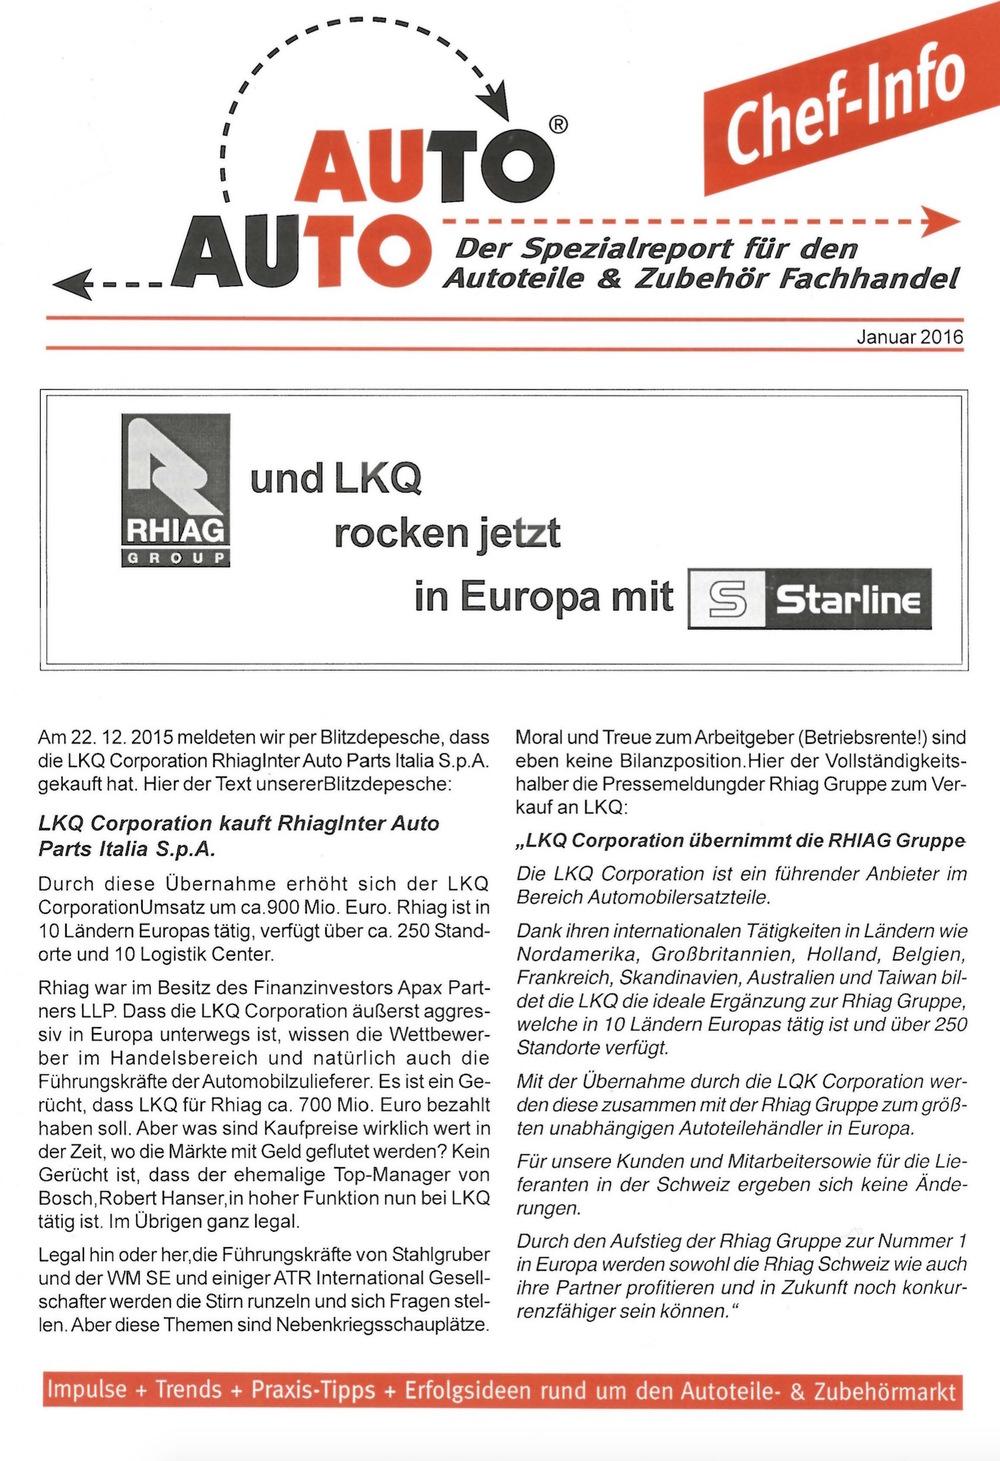 2016-01_Auto_Auto_Starline.jpg